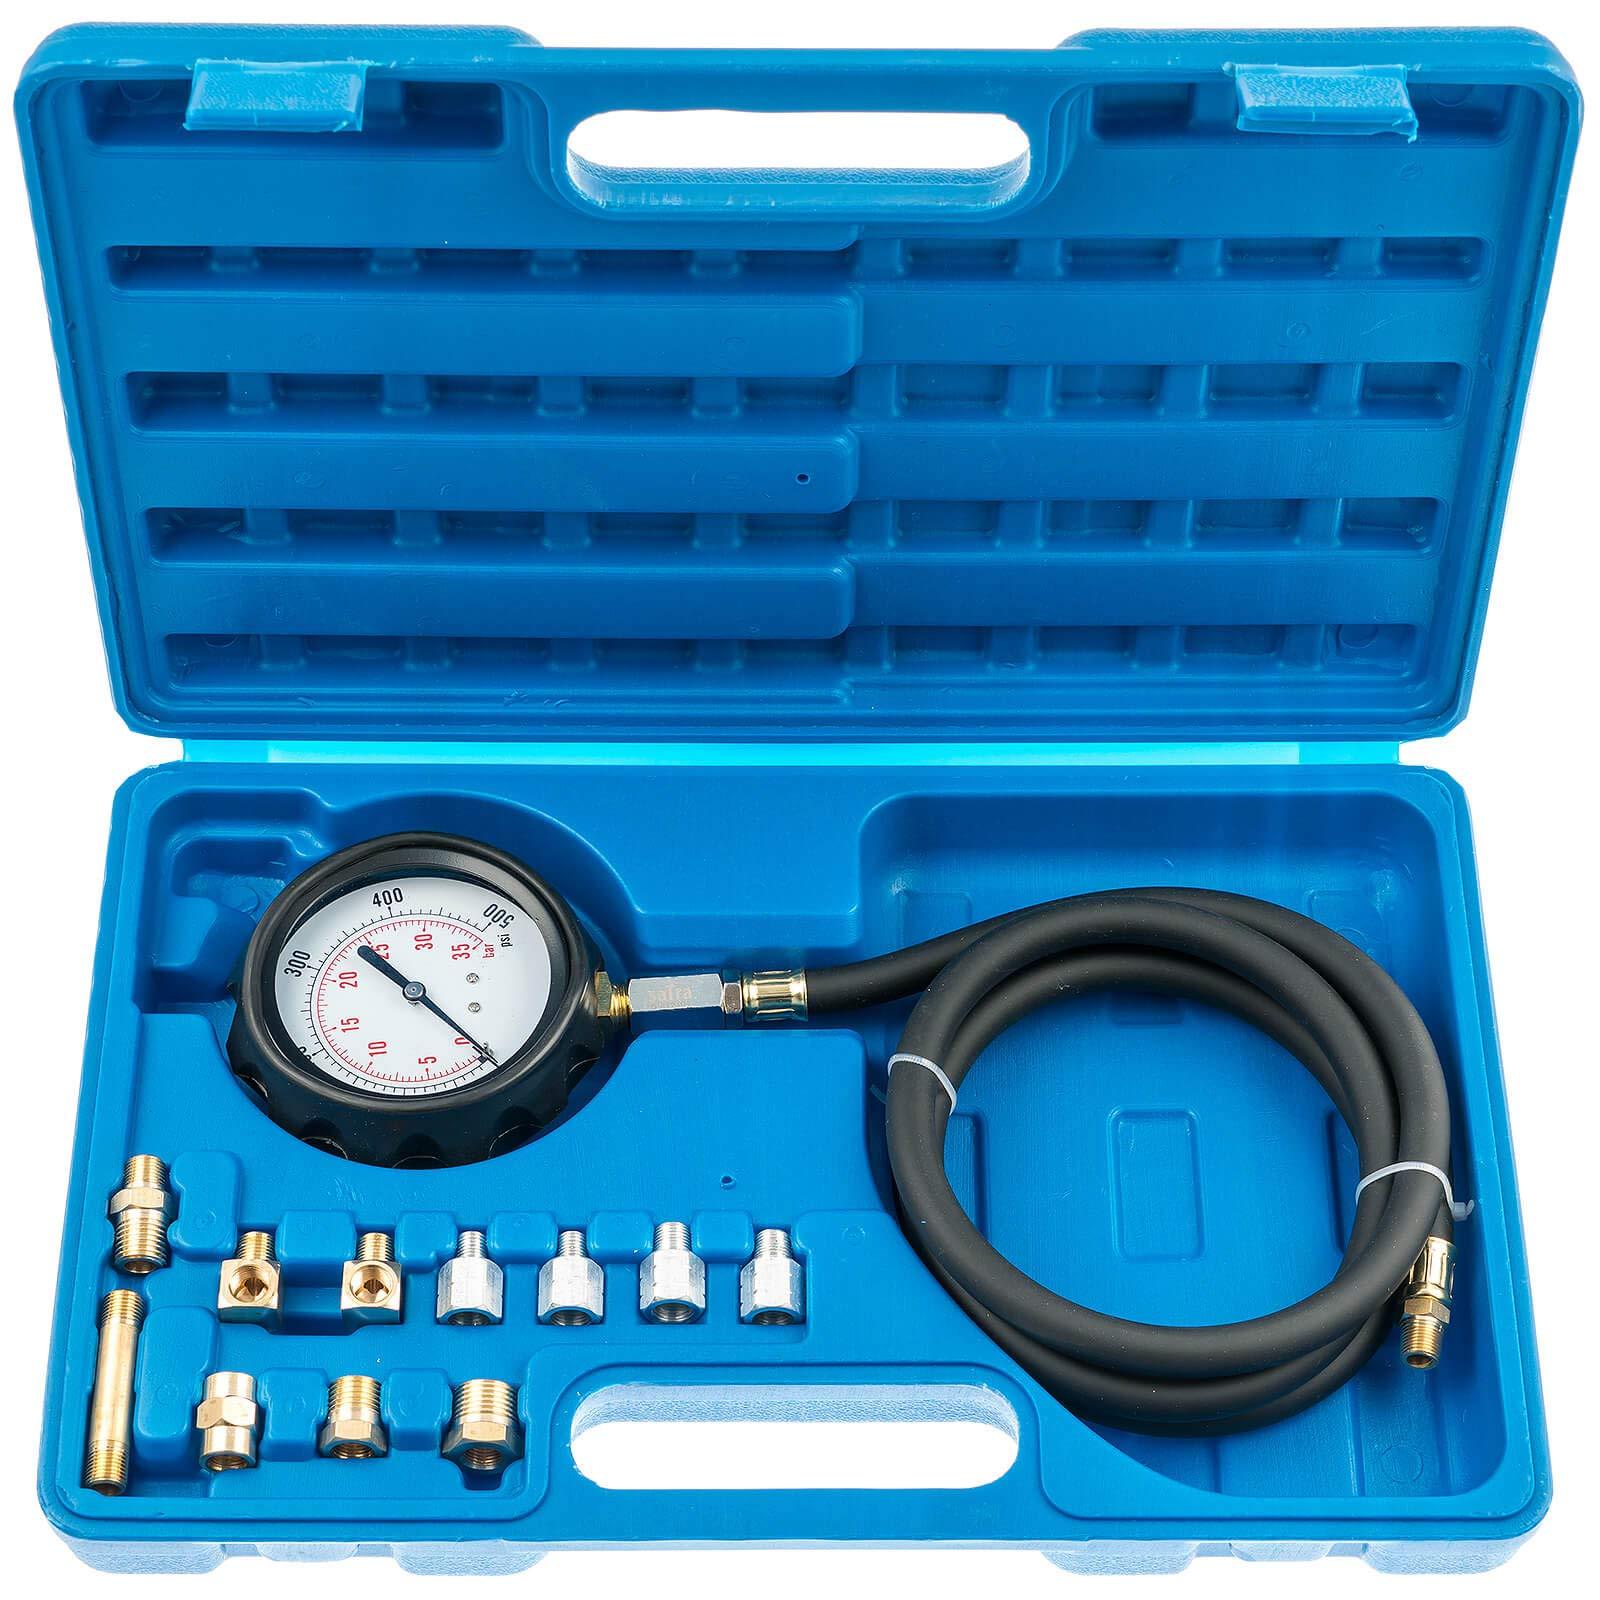 FreeTec Professional Petrol Gas Engine Cylinder Compression Tester Gauge Kit Auto Tool